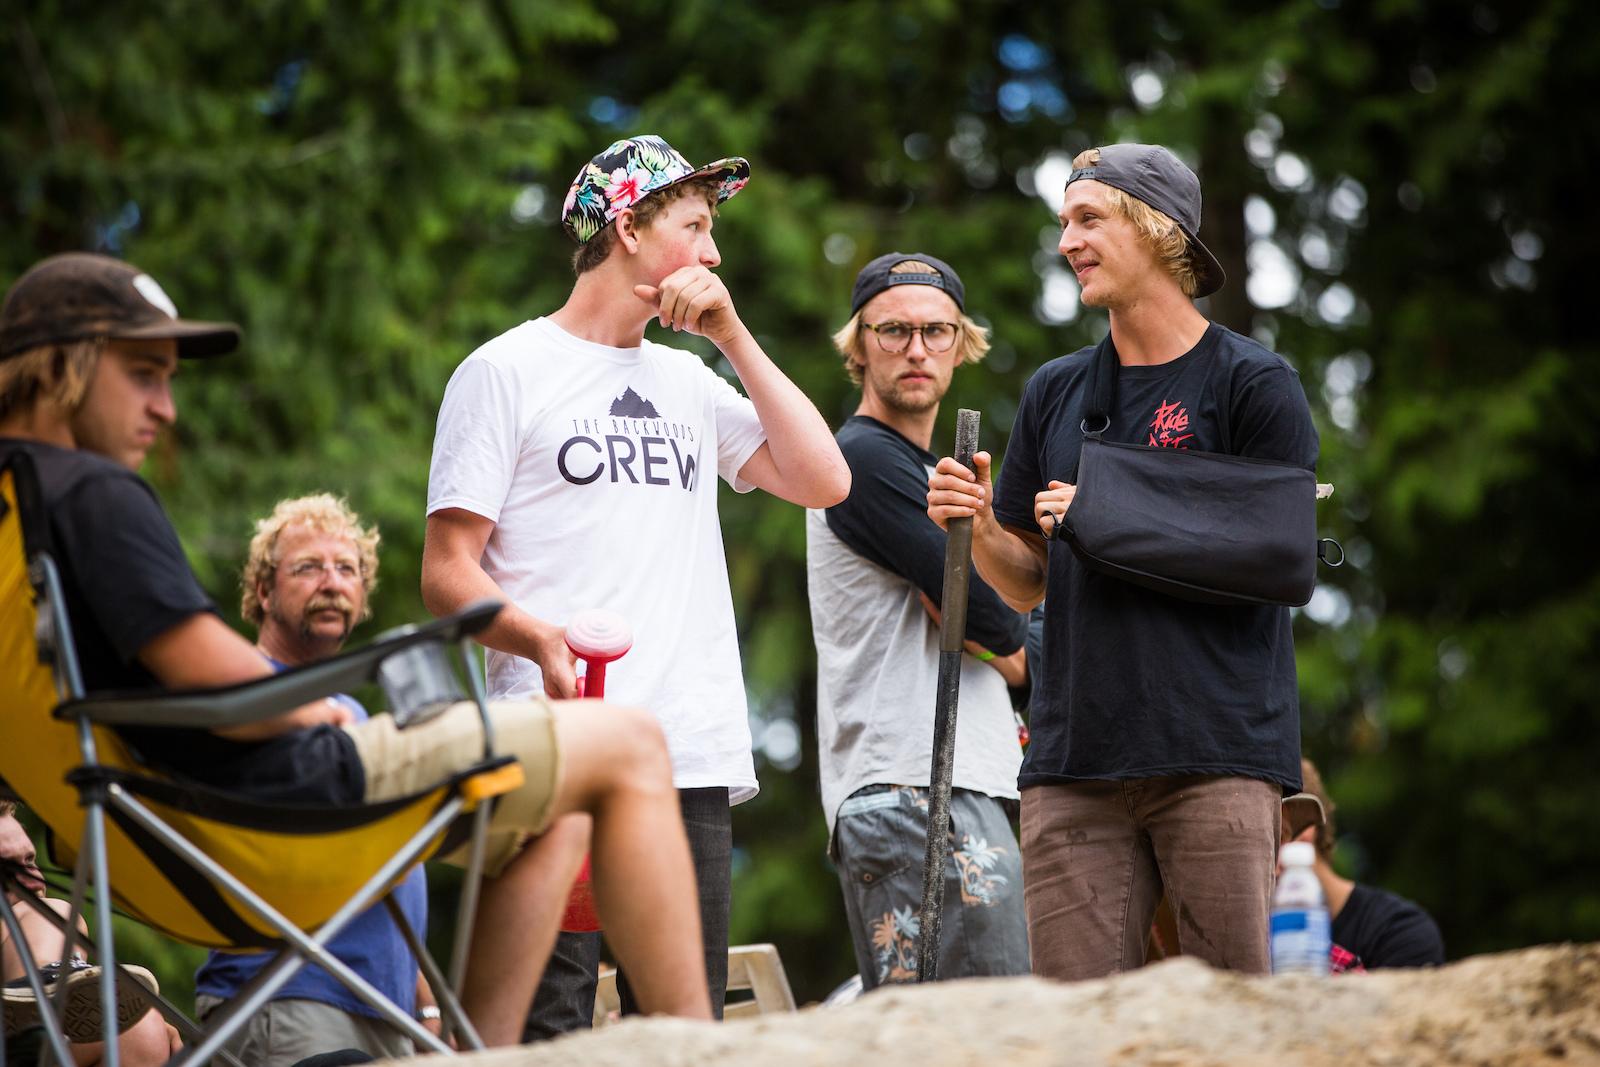 Dylan Dunkerton Photo The Backwoods Jam 2016 at Coast Gravity Park